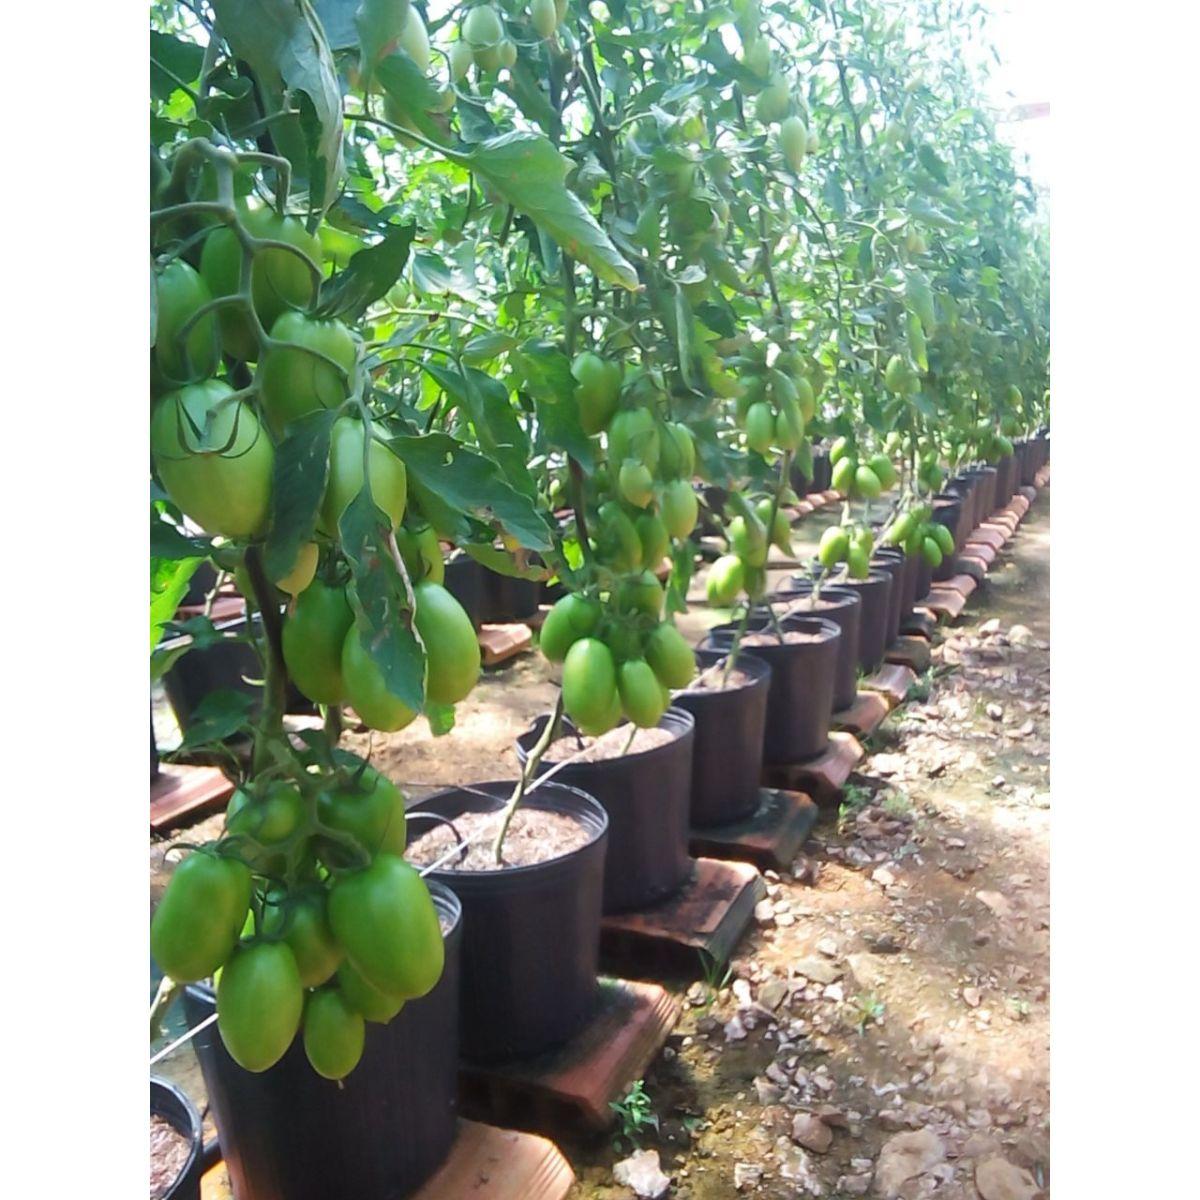 Semente Tomate Híbrido Vero (HS1188) (Horticeres Ouro) - 1.000 sementes